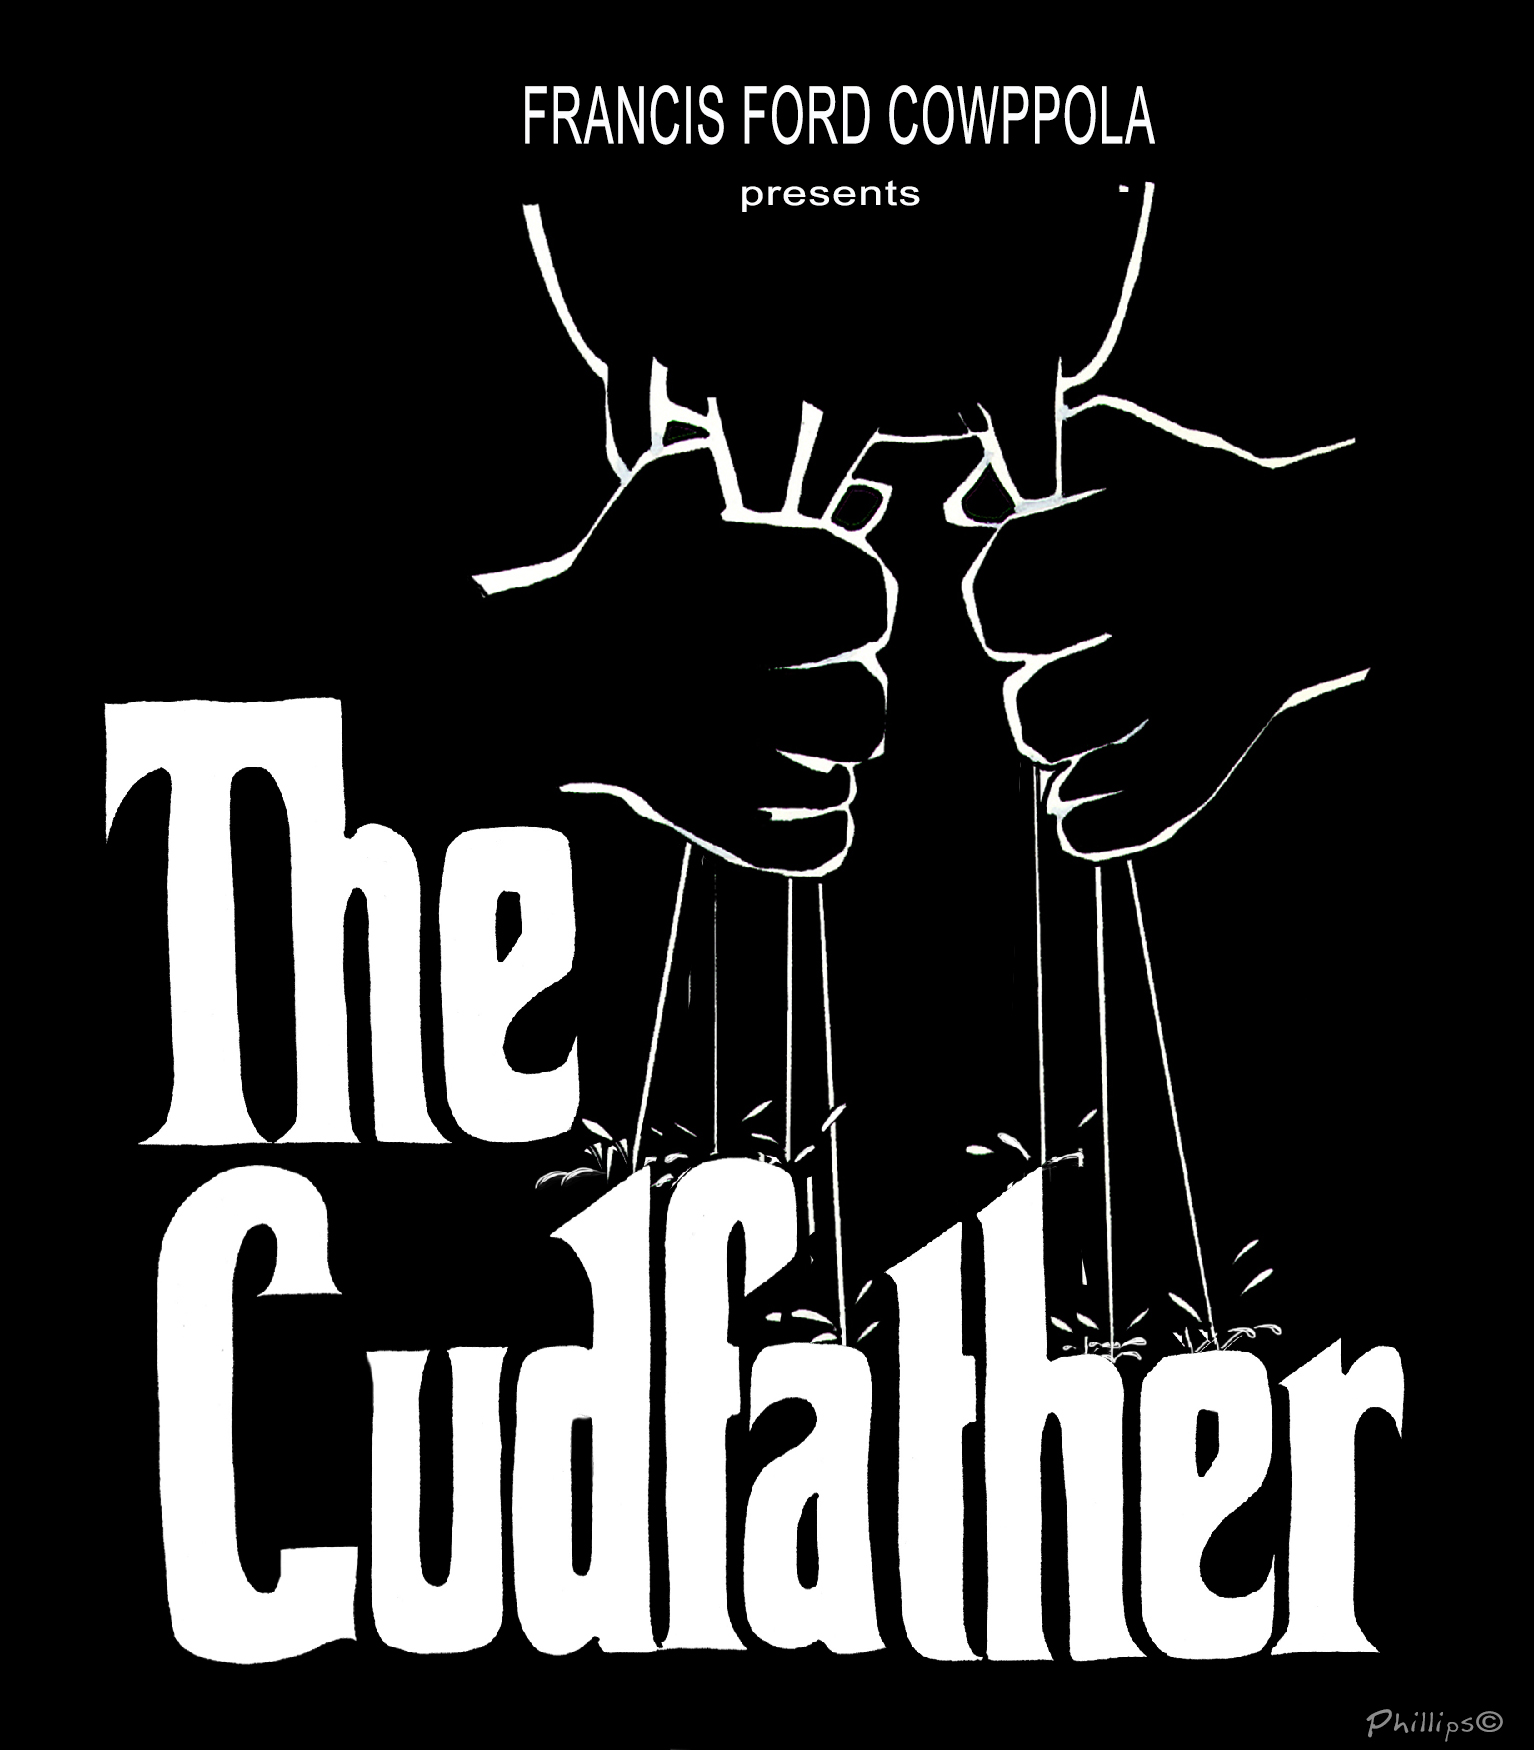 Cudfather2 copy.jpg